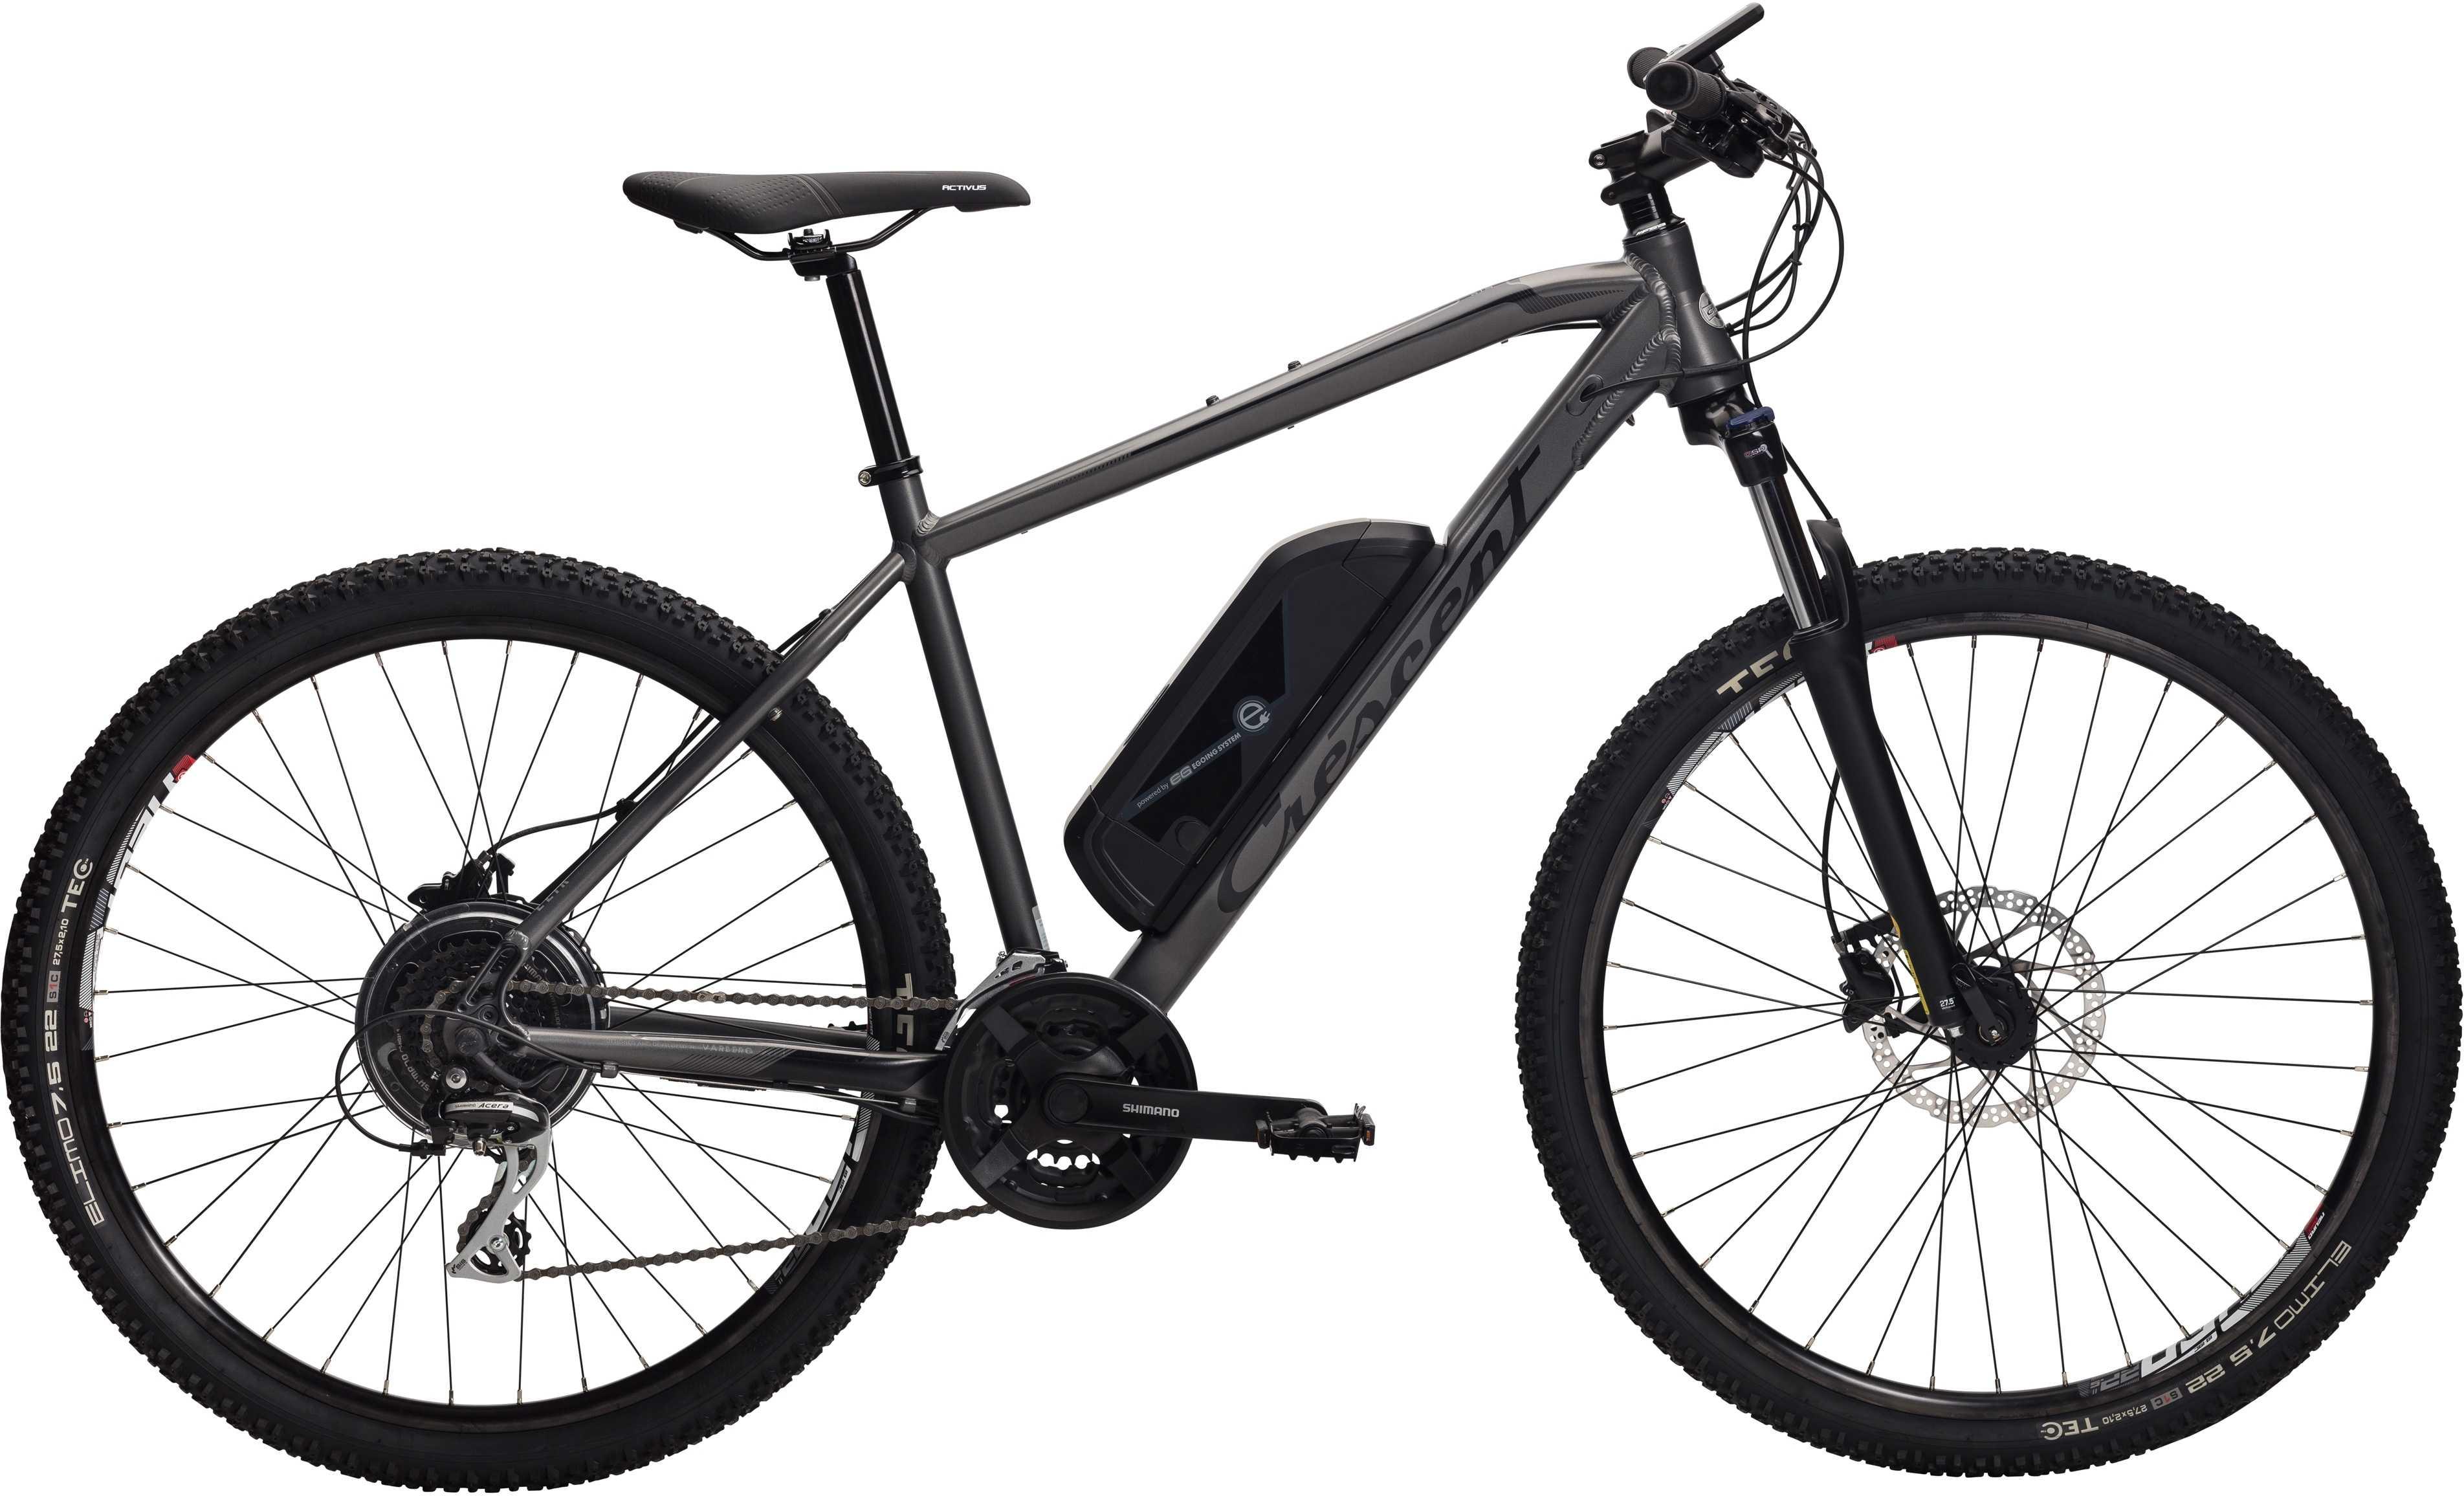 CRESCENT ELIR MATGR | City-cykler